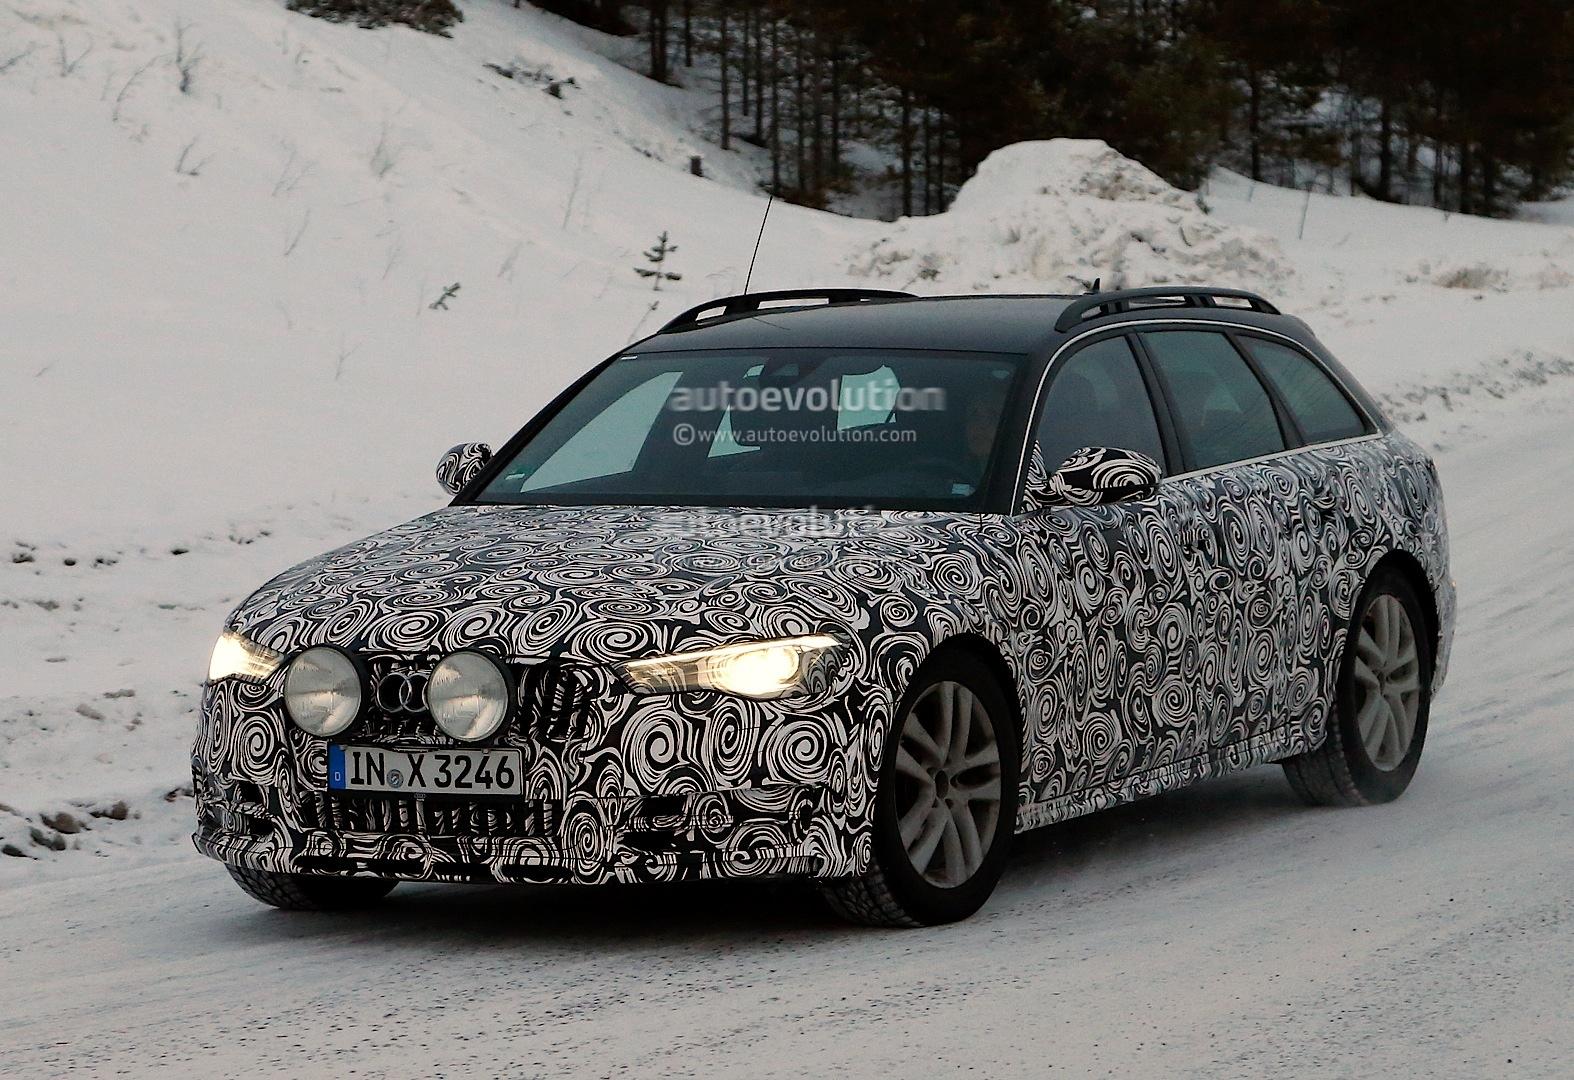 Audi a6 vs 2015 a6 facelift comparison headlights and taillights autoevolution